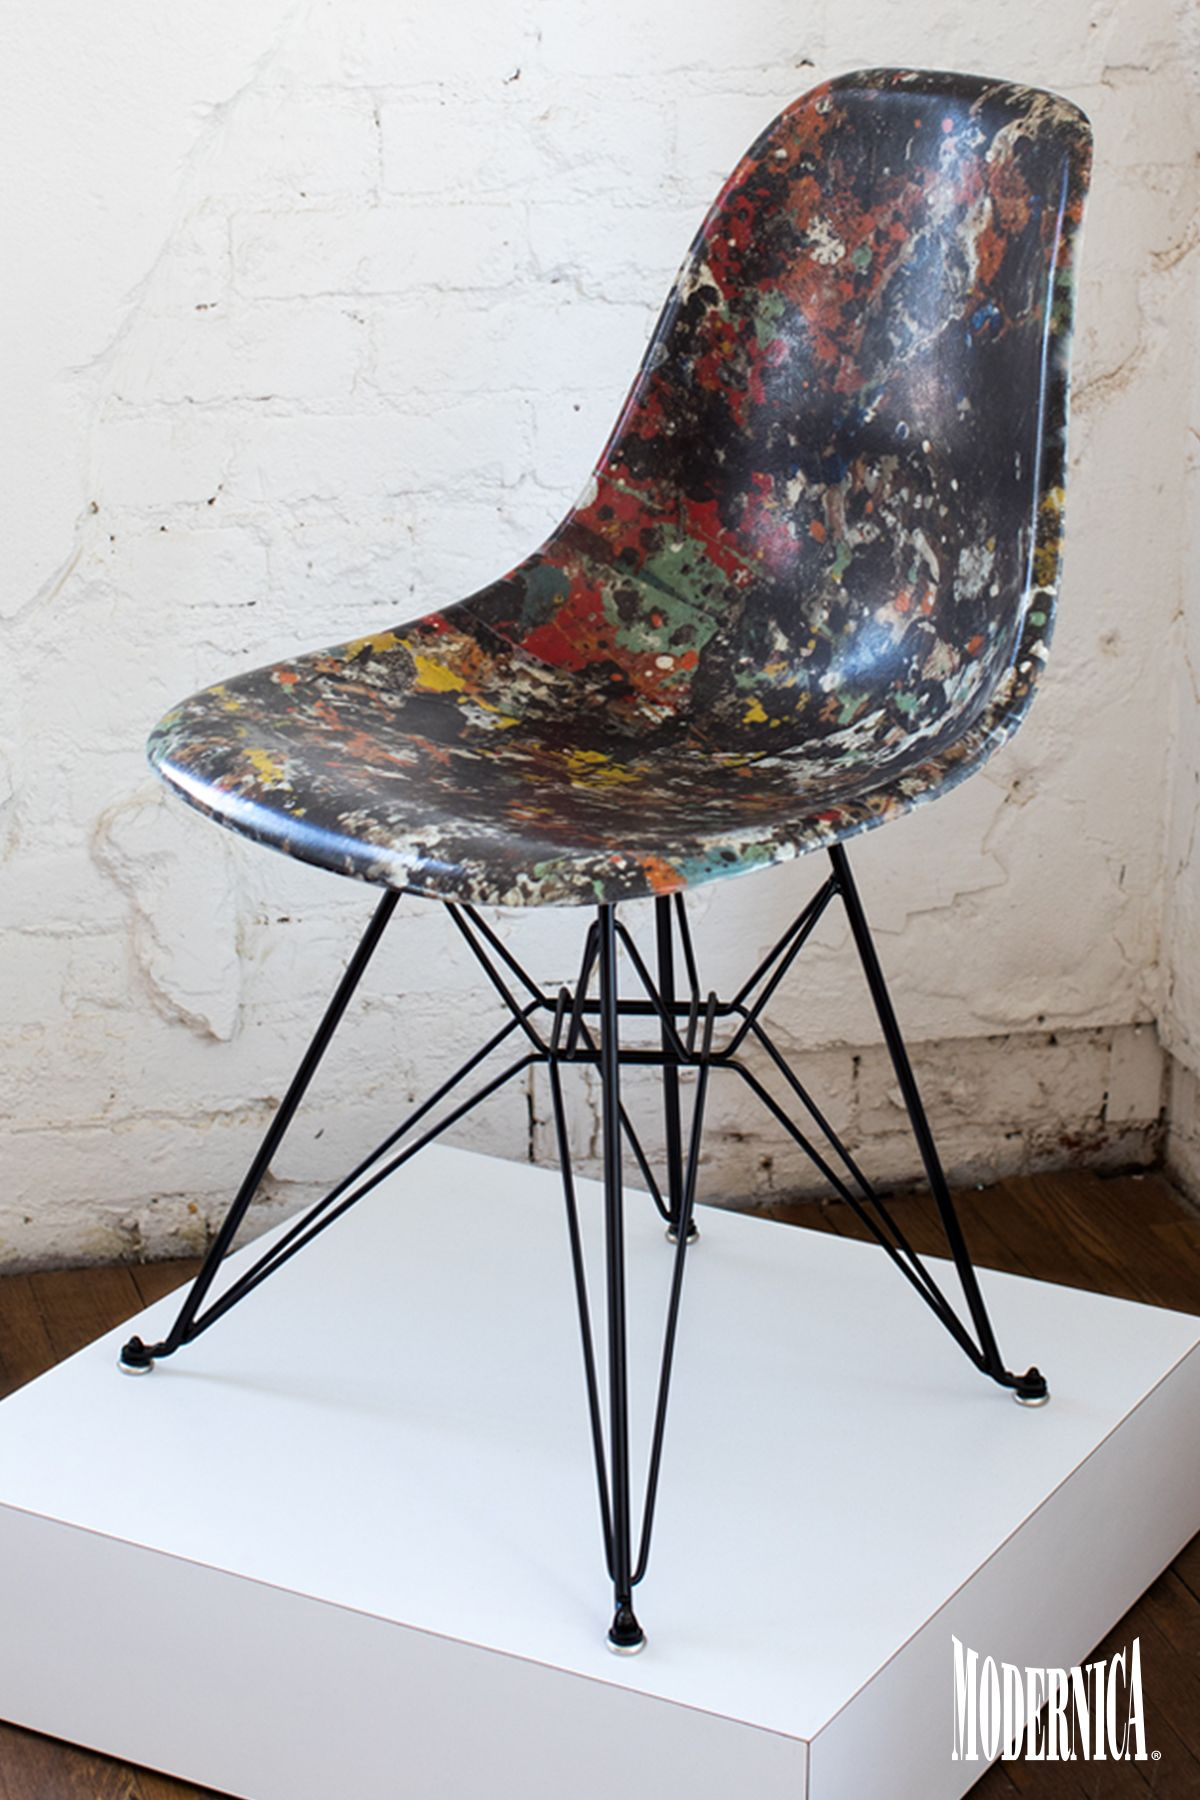 Modernica x The Hundreds x Jackson Pollock